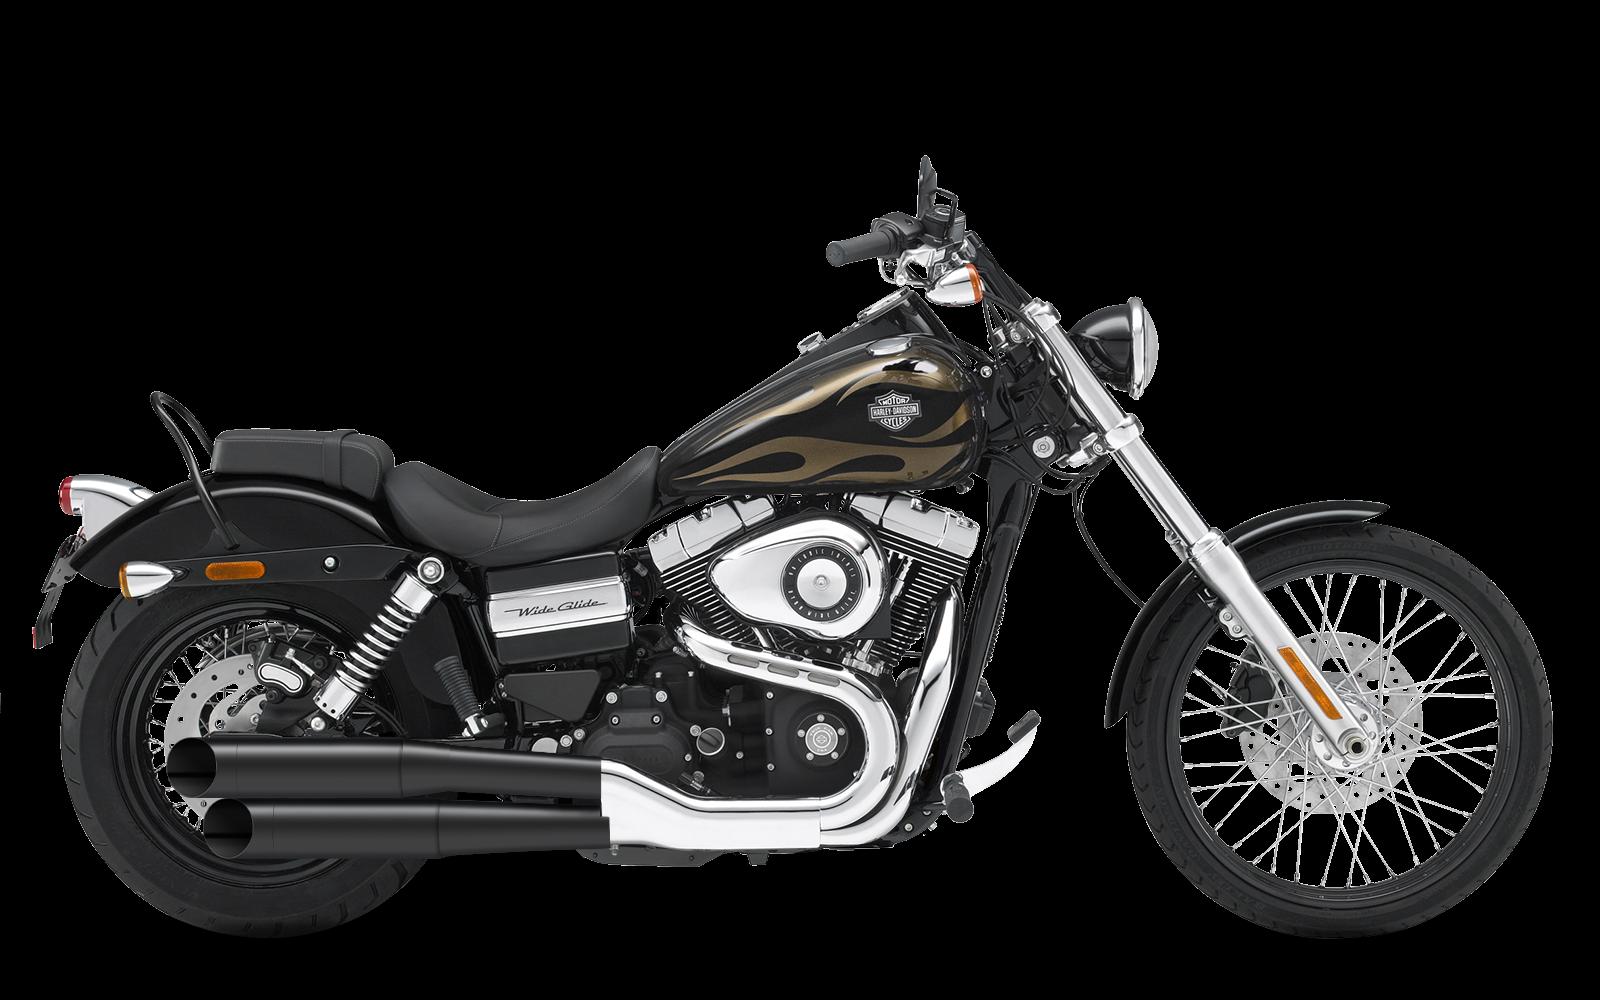 Dyna - Wide Glide - TC103 - 2013-2016 - Slipons